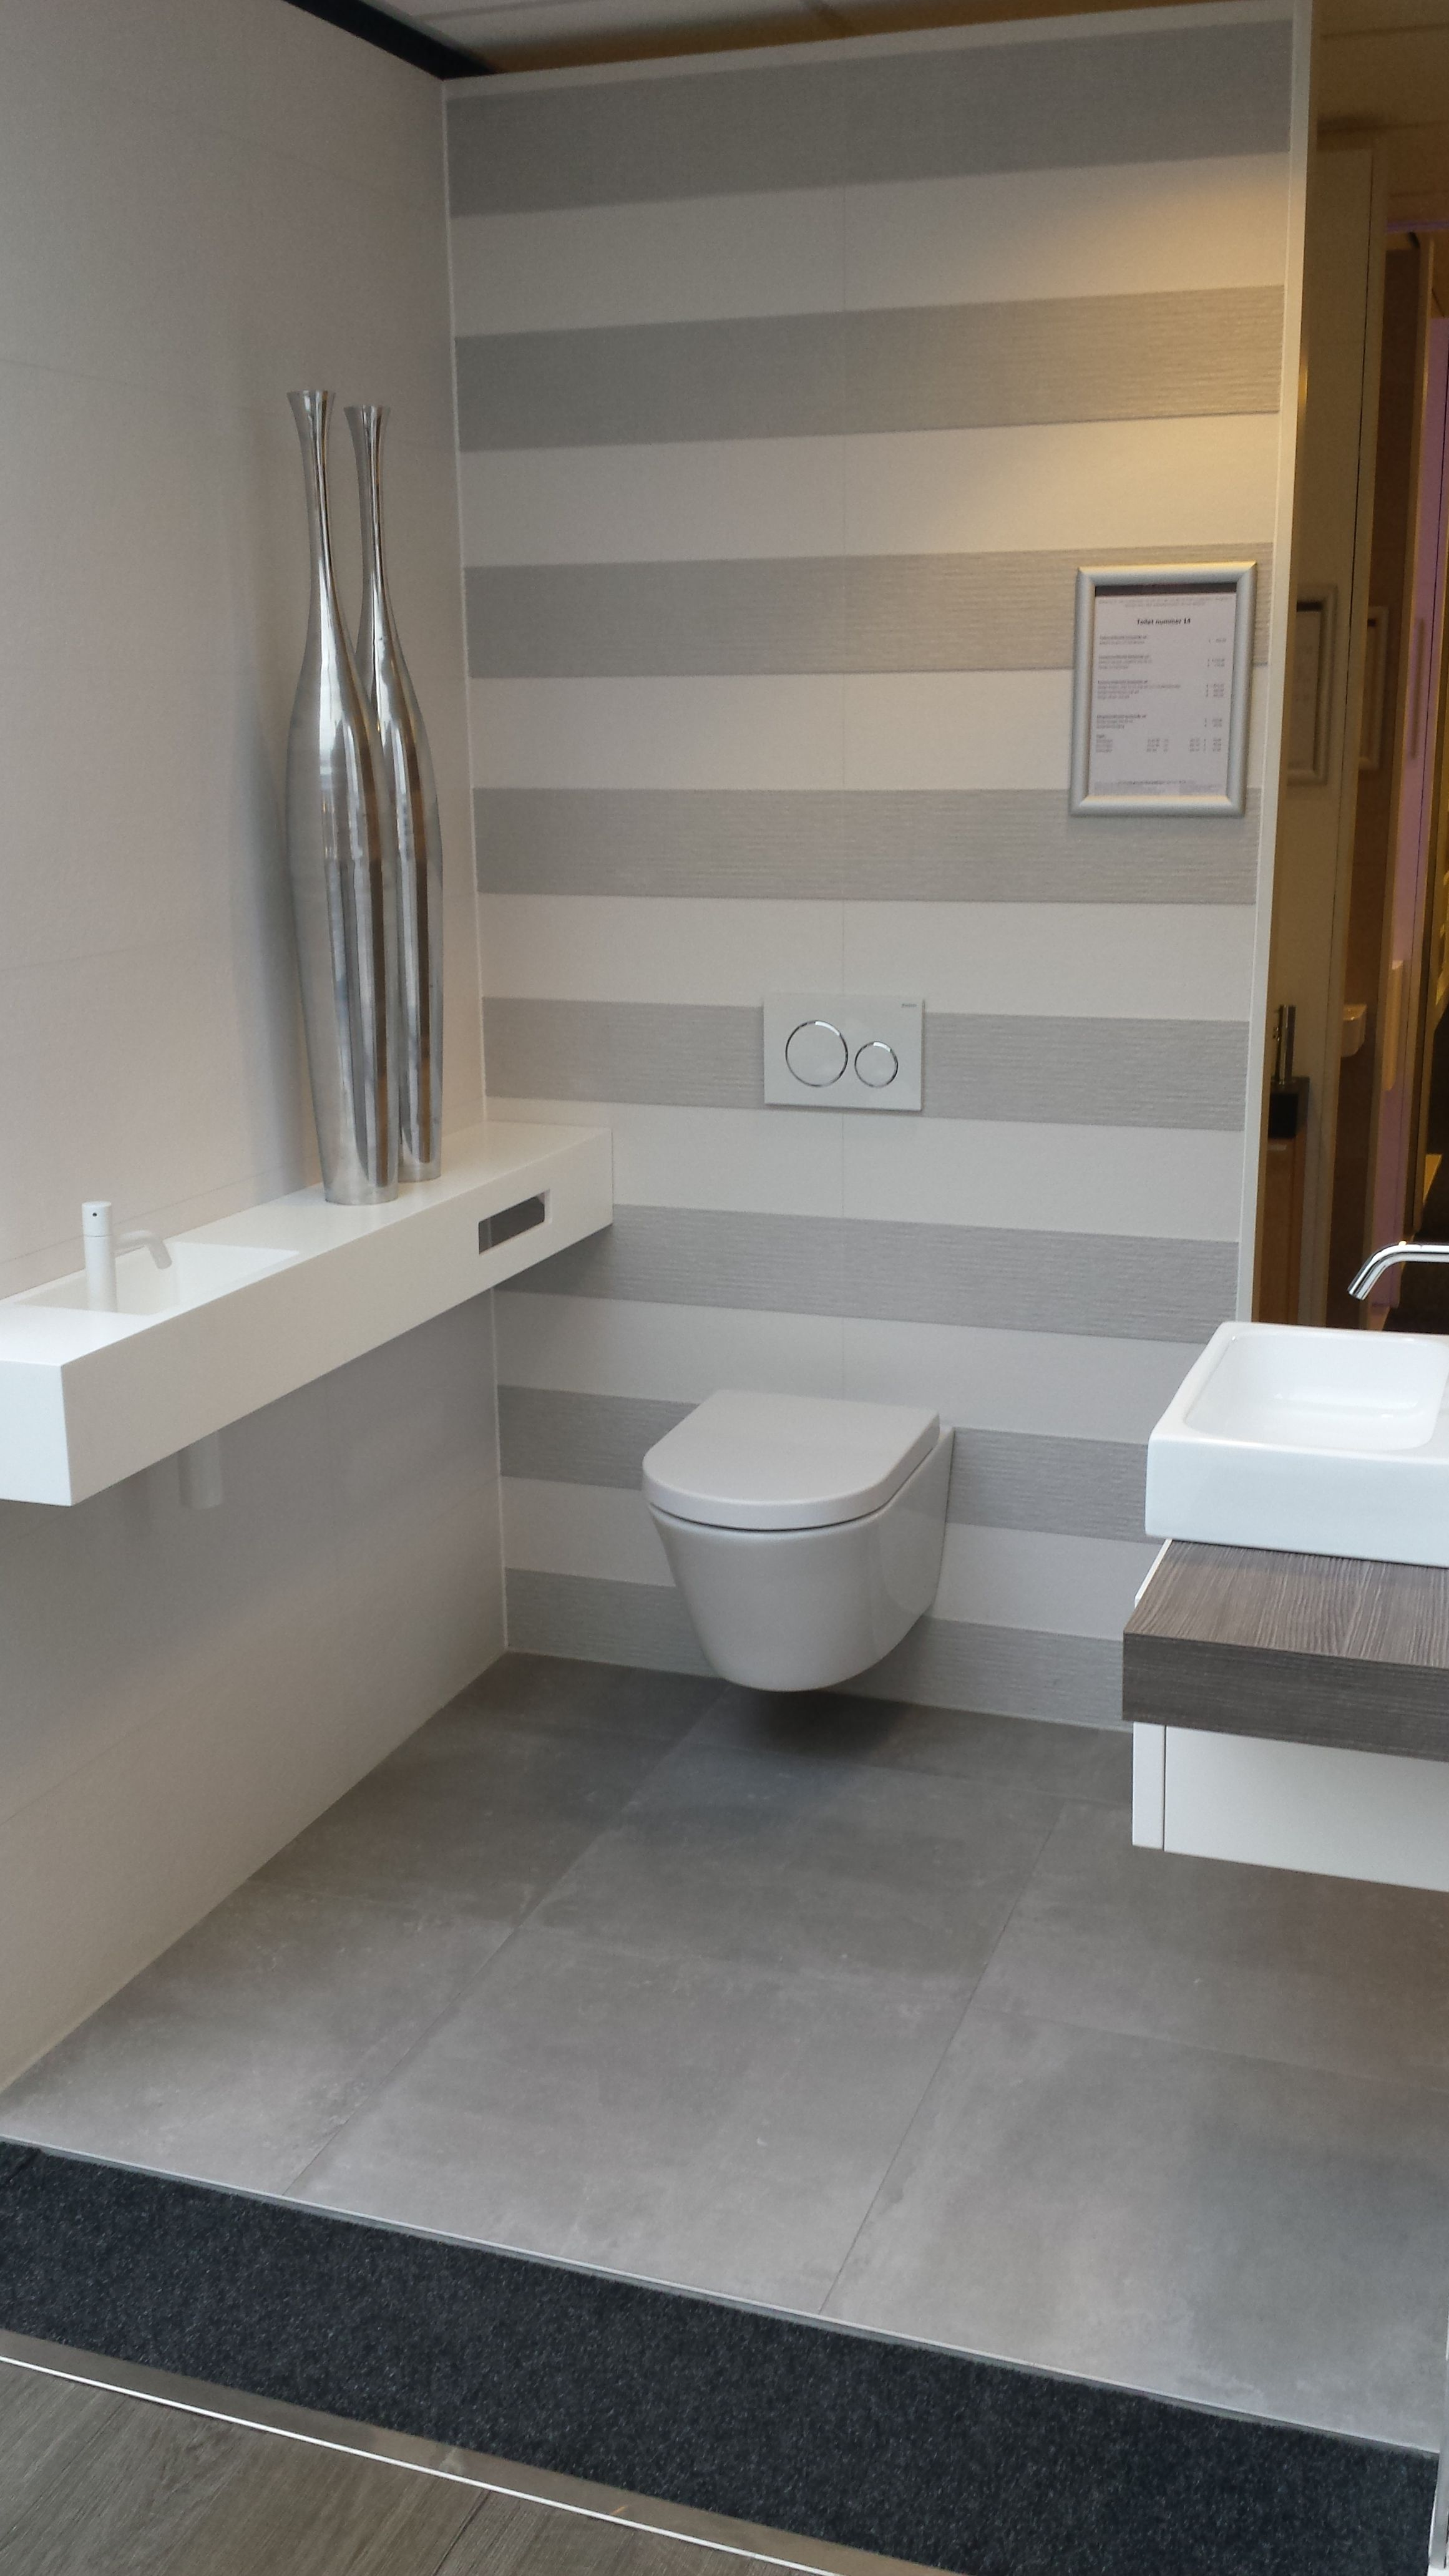 design #inspiration #bathroom #shower #badkamer #bath #hotbath ...